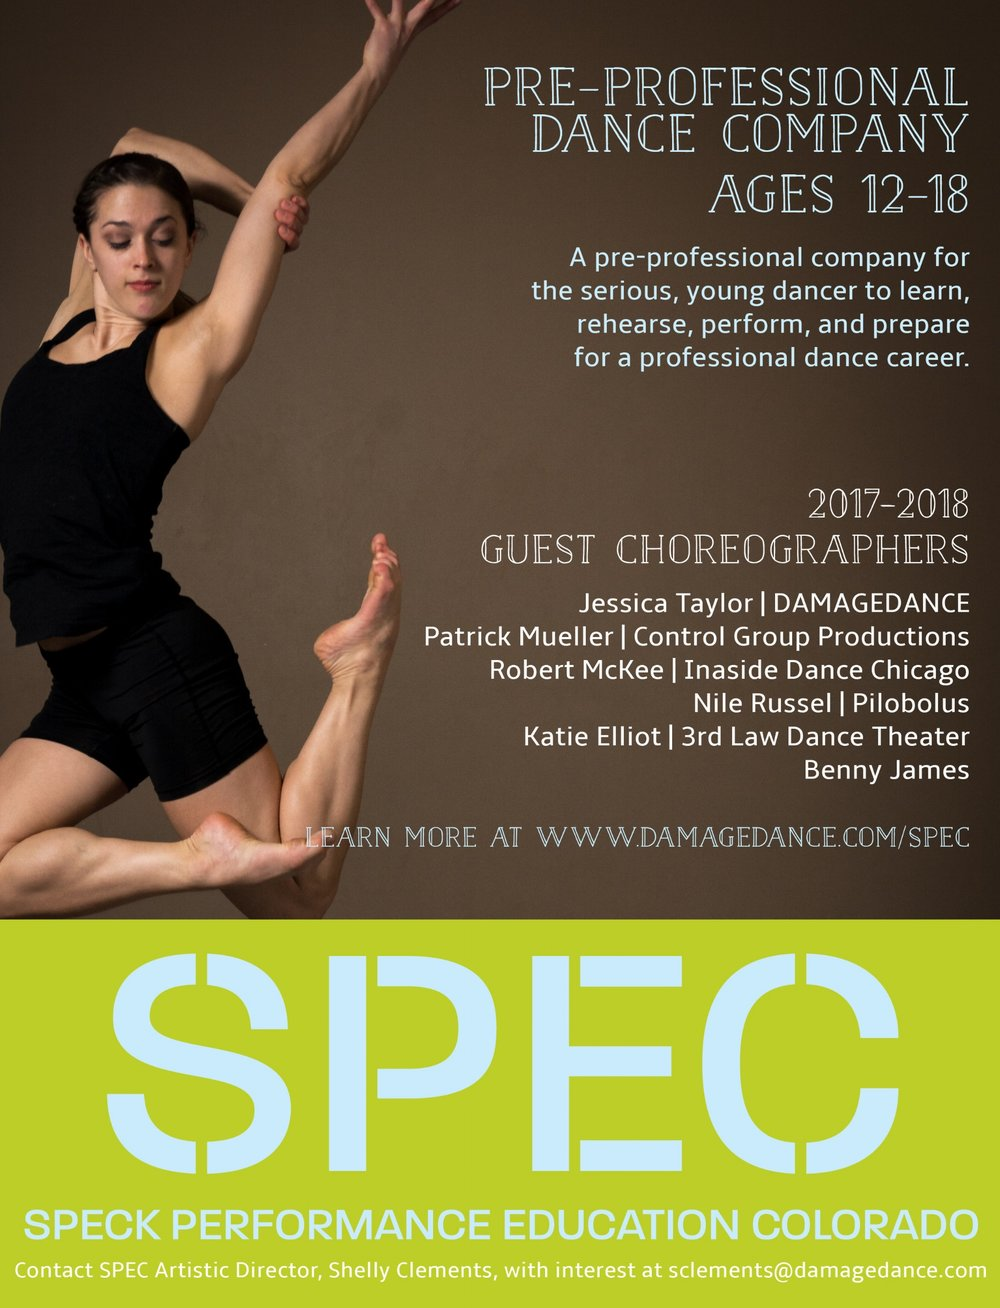 SPEC Poster 2.jpg